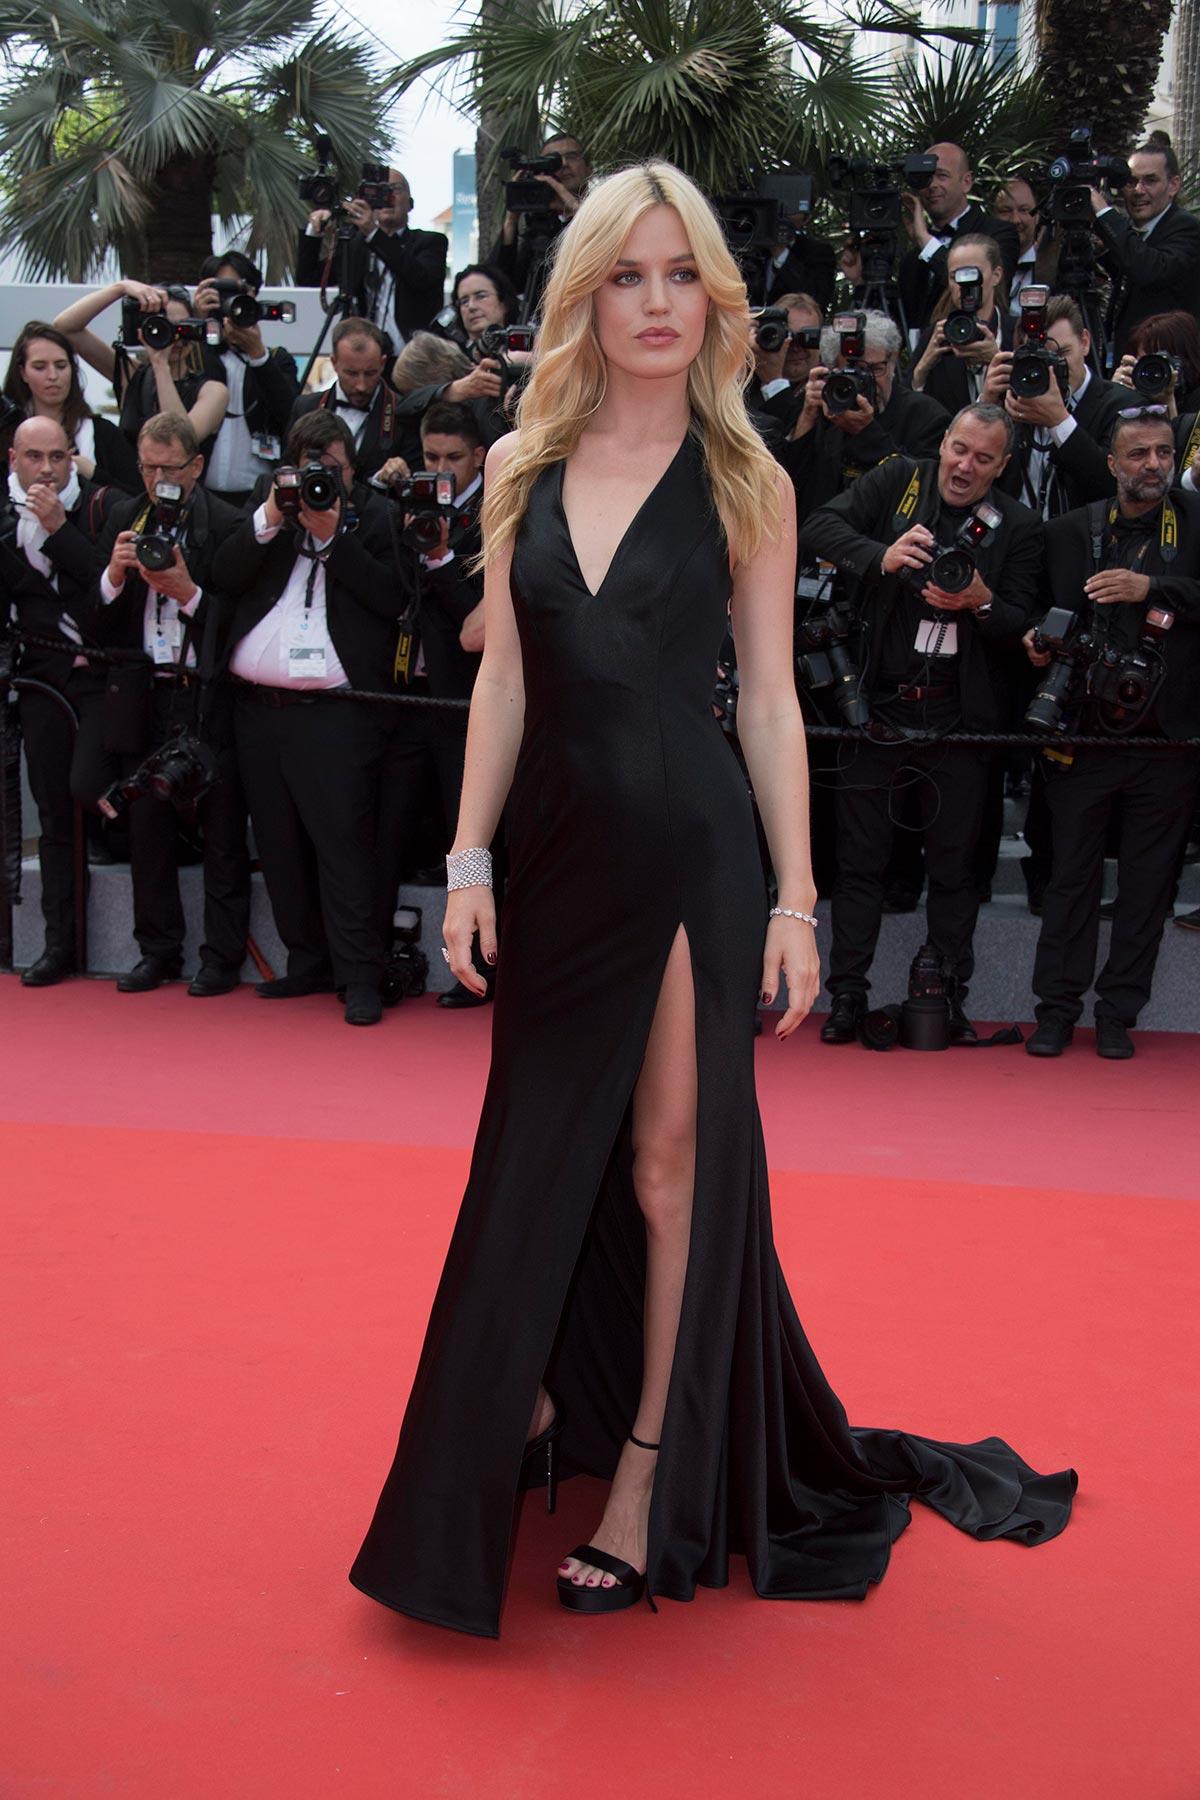 Cannes 2018 - Red carpet - Georgia May Jagger - Hair Massimo Serini